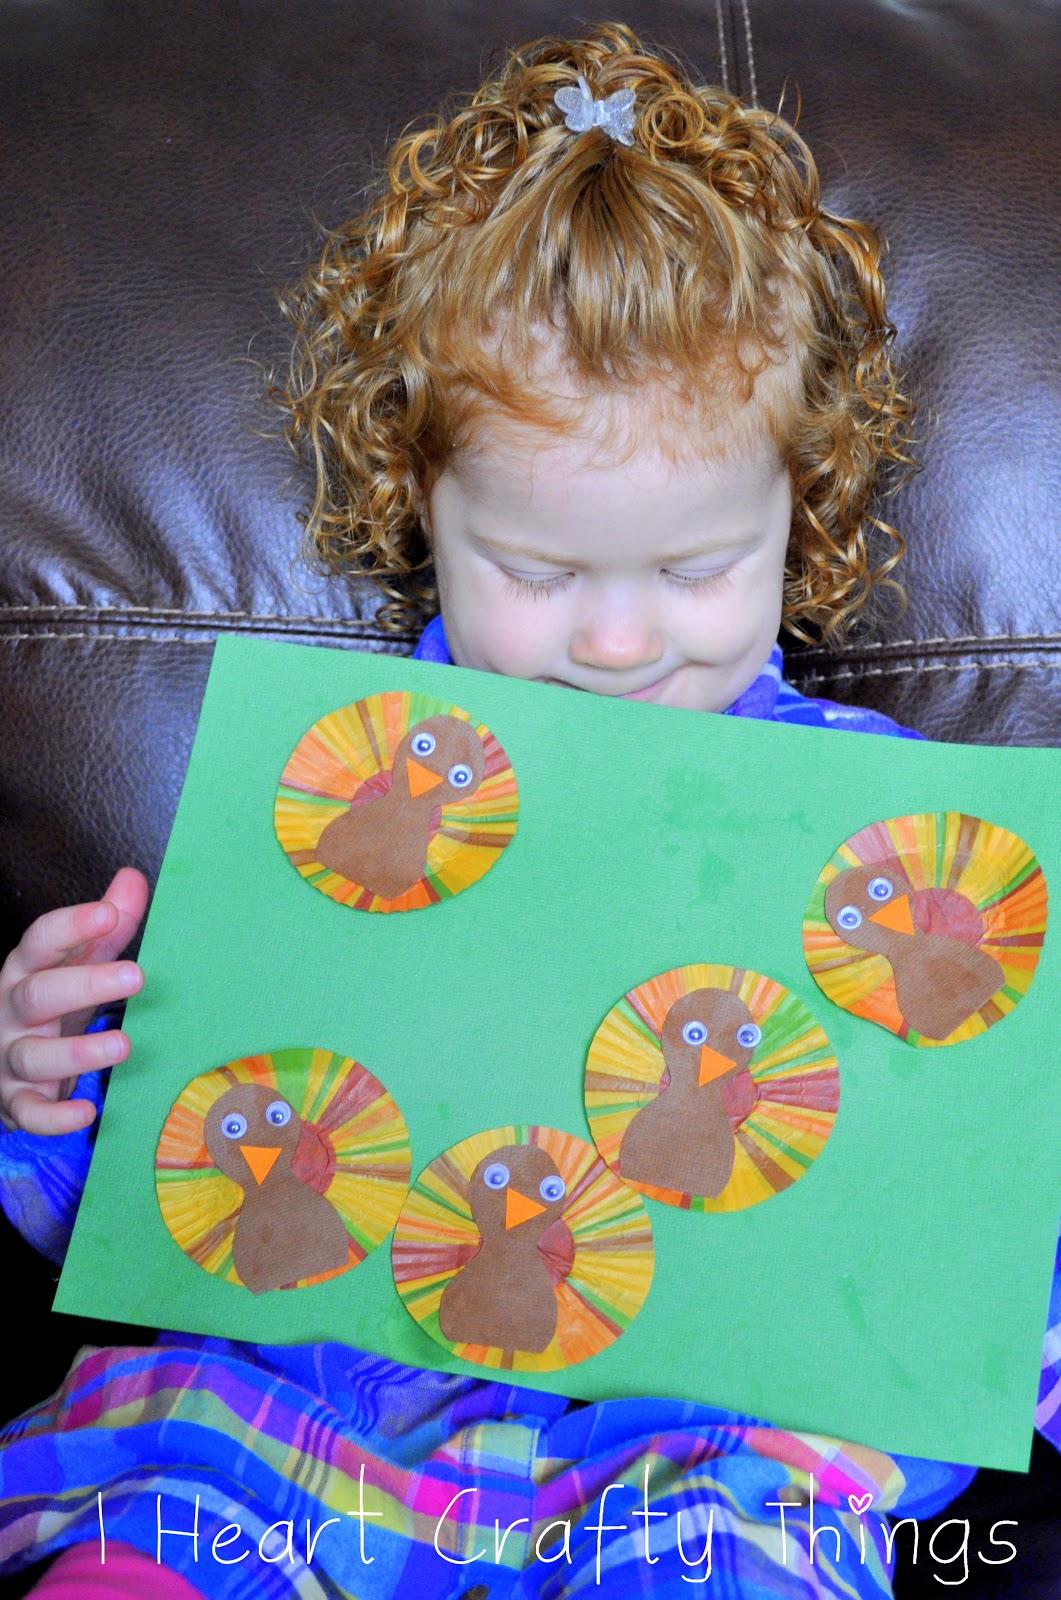 Five Little Turkeys Craft | I Heart Crafty Things